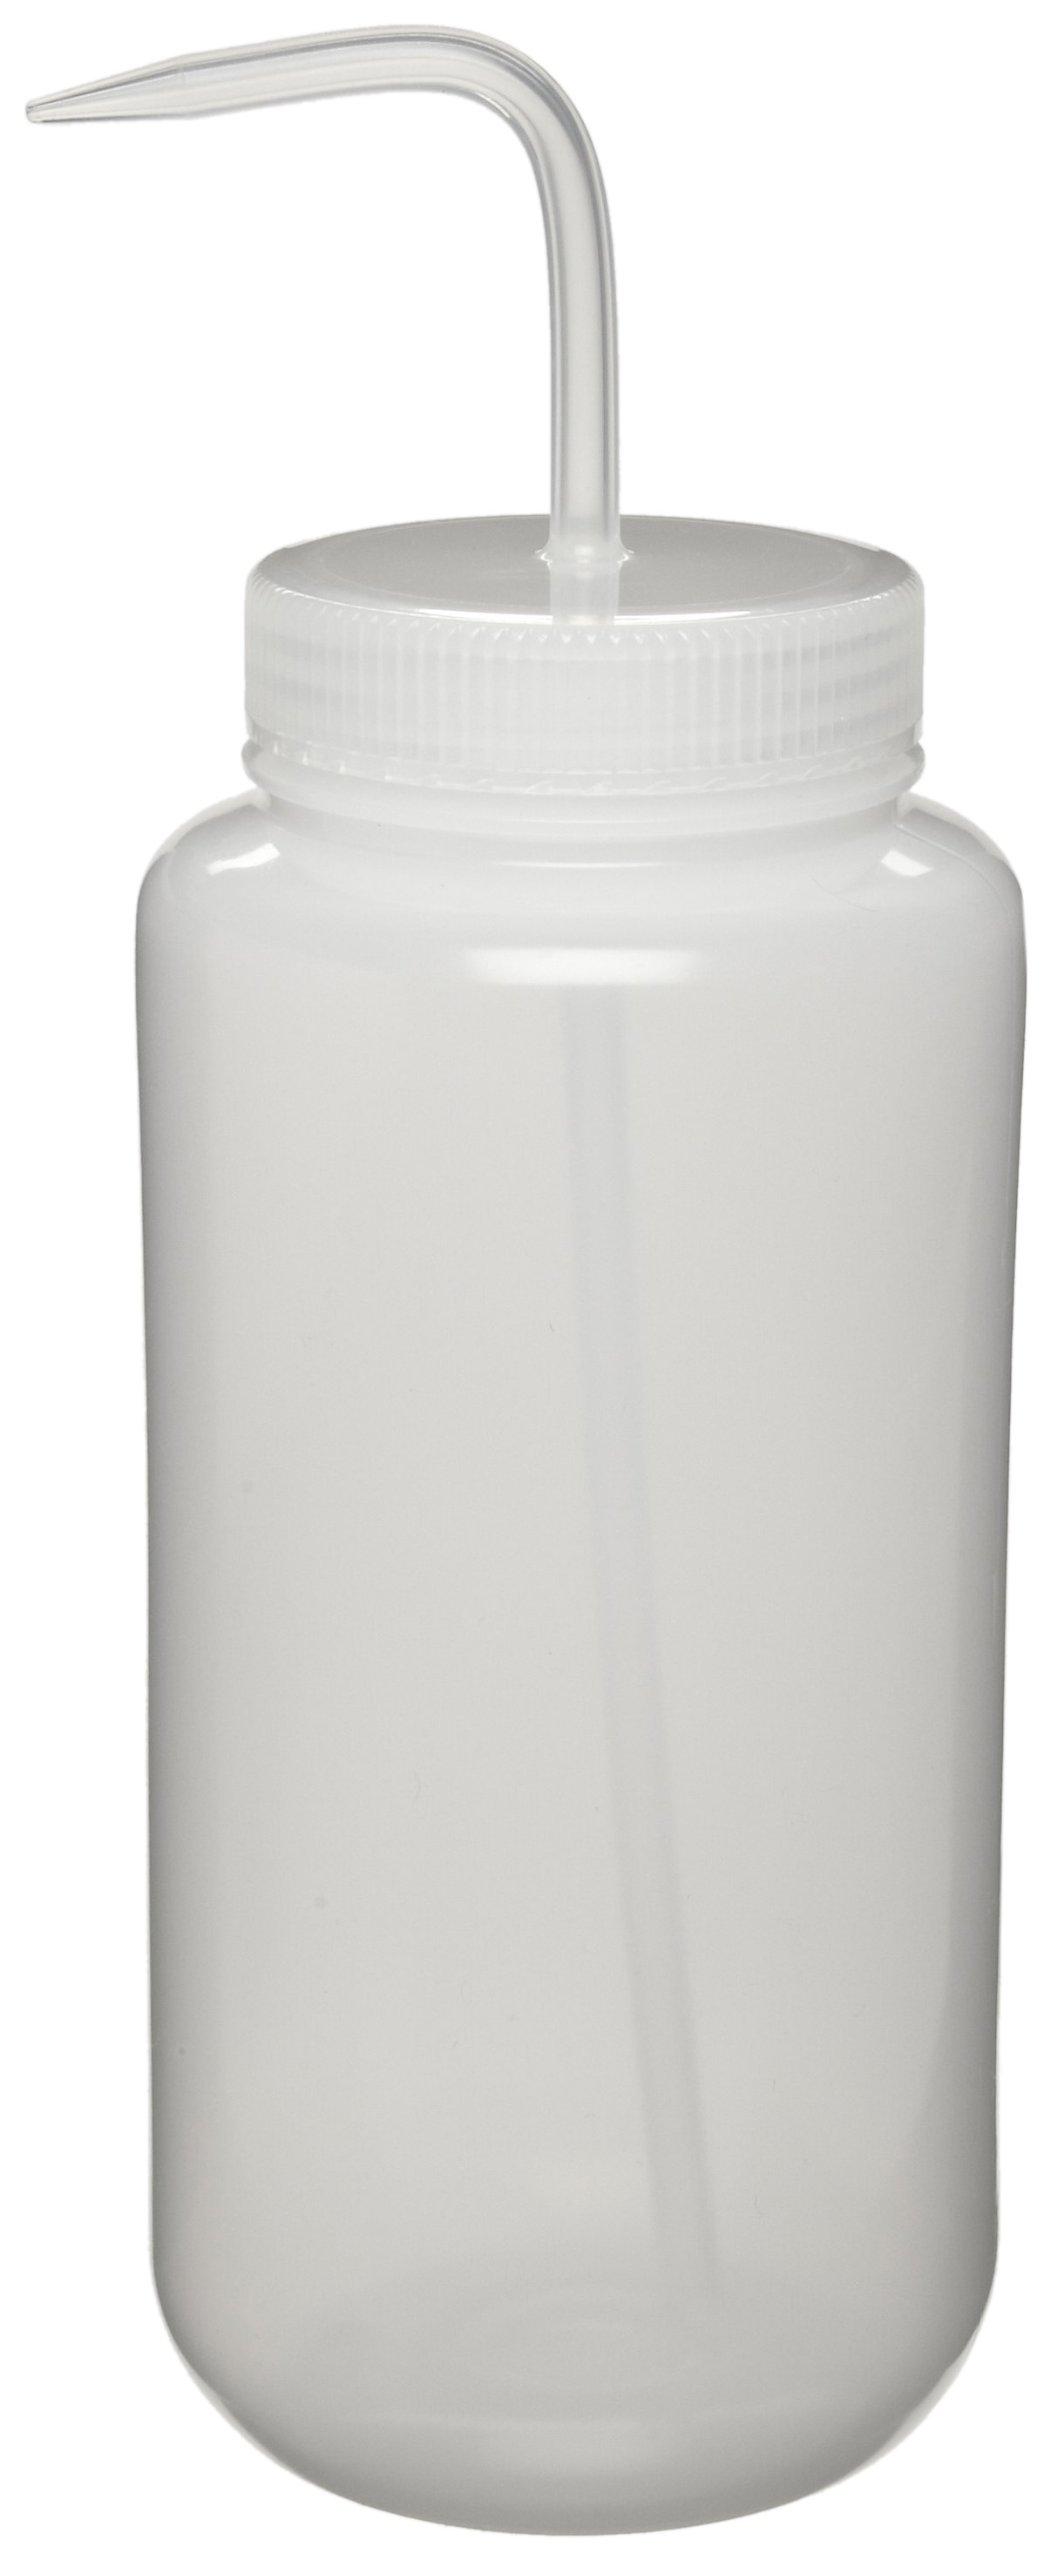 Nalgene 2407-1000 Wide-Mouth Wash Bottle, LDPE, 1000mL (Pack of 2) by Nalgene